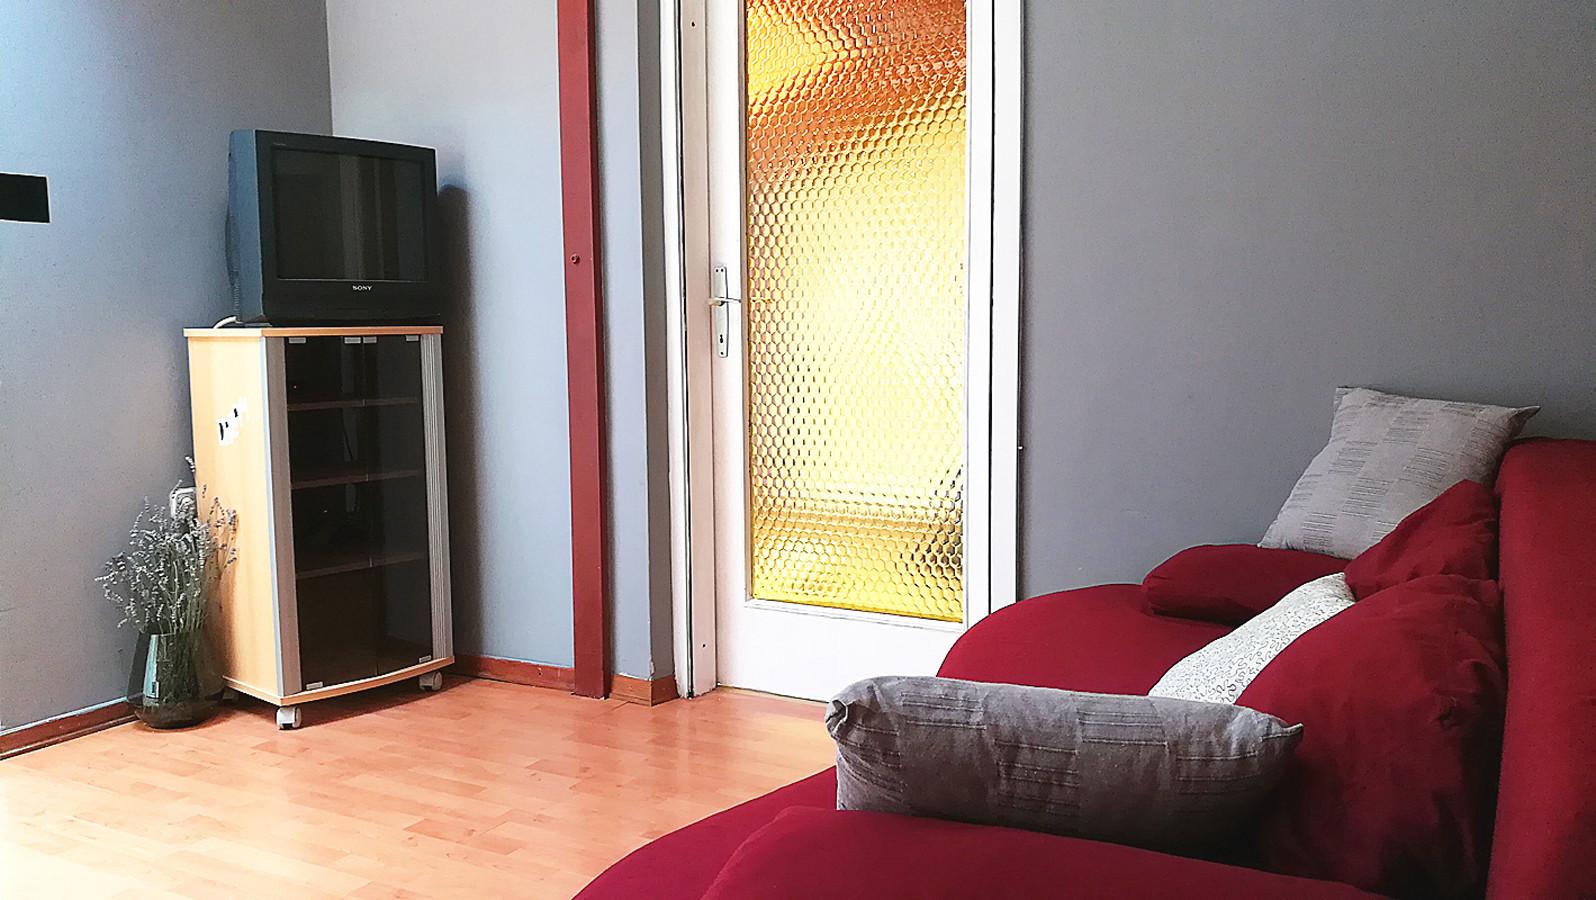 a-double-bedroom-attic-eastern-11963e09818e1d573251b3dae1abccfb